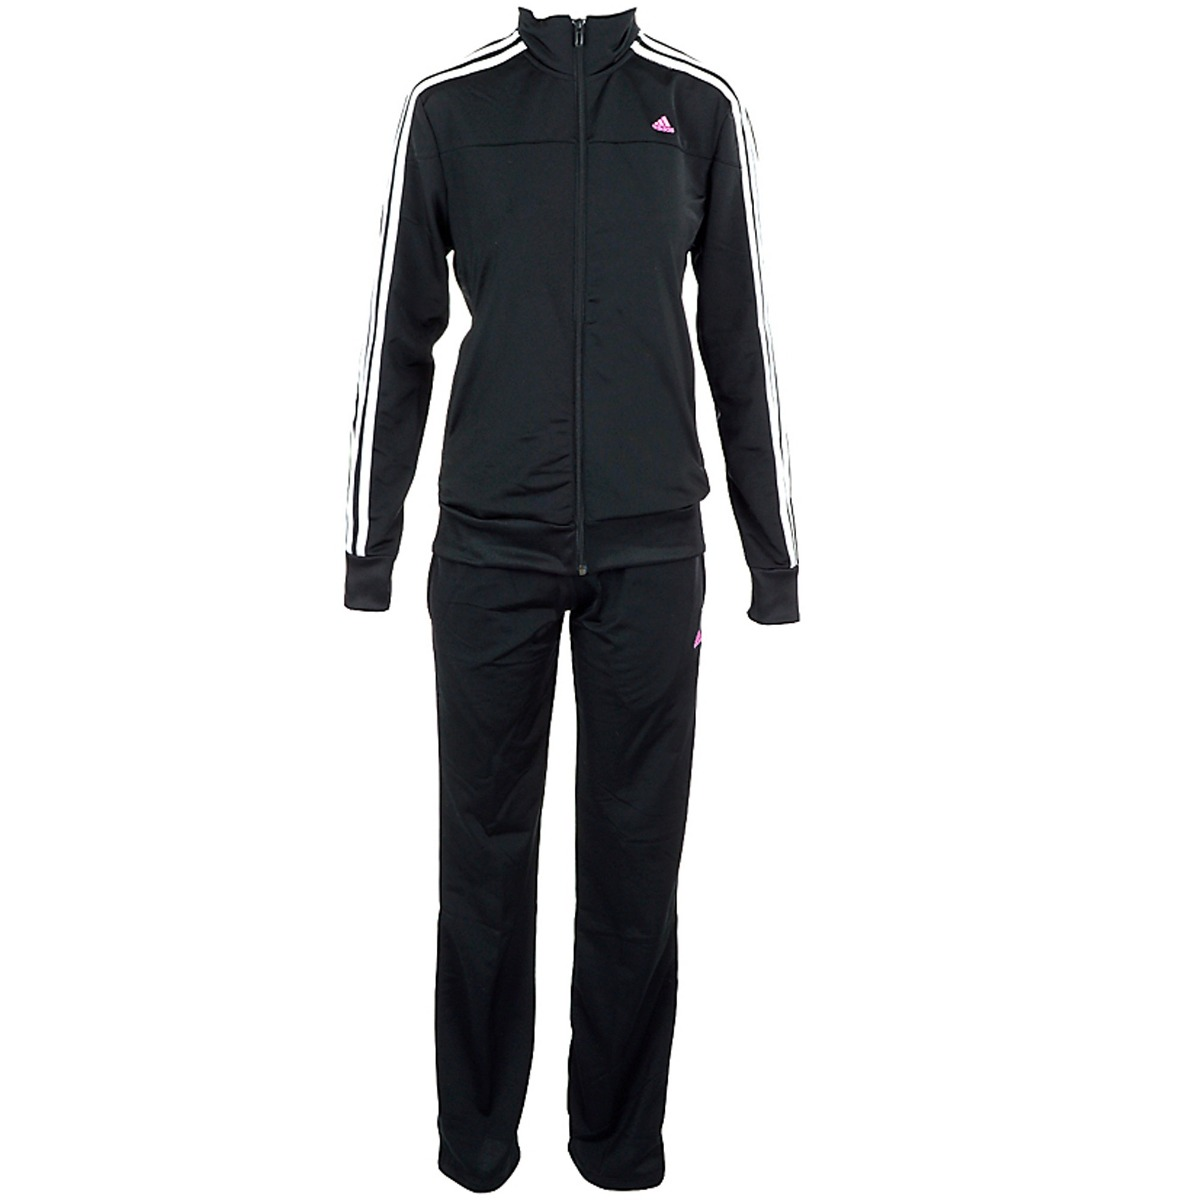 a04f9934ba78b Pants Con Sudadera Para Entrenar Mujer adidas S23596 -   599.00 en ...